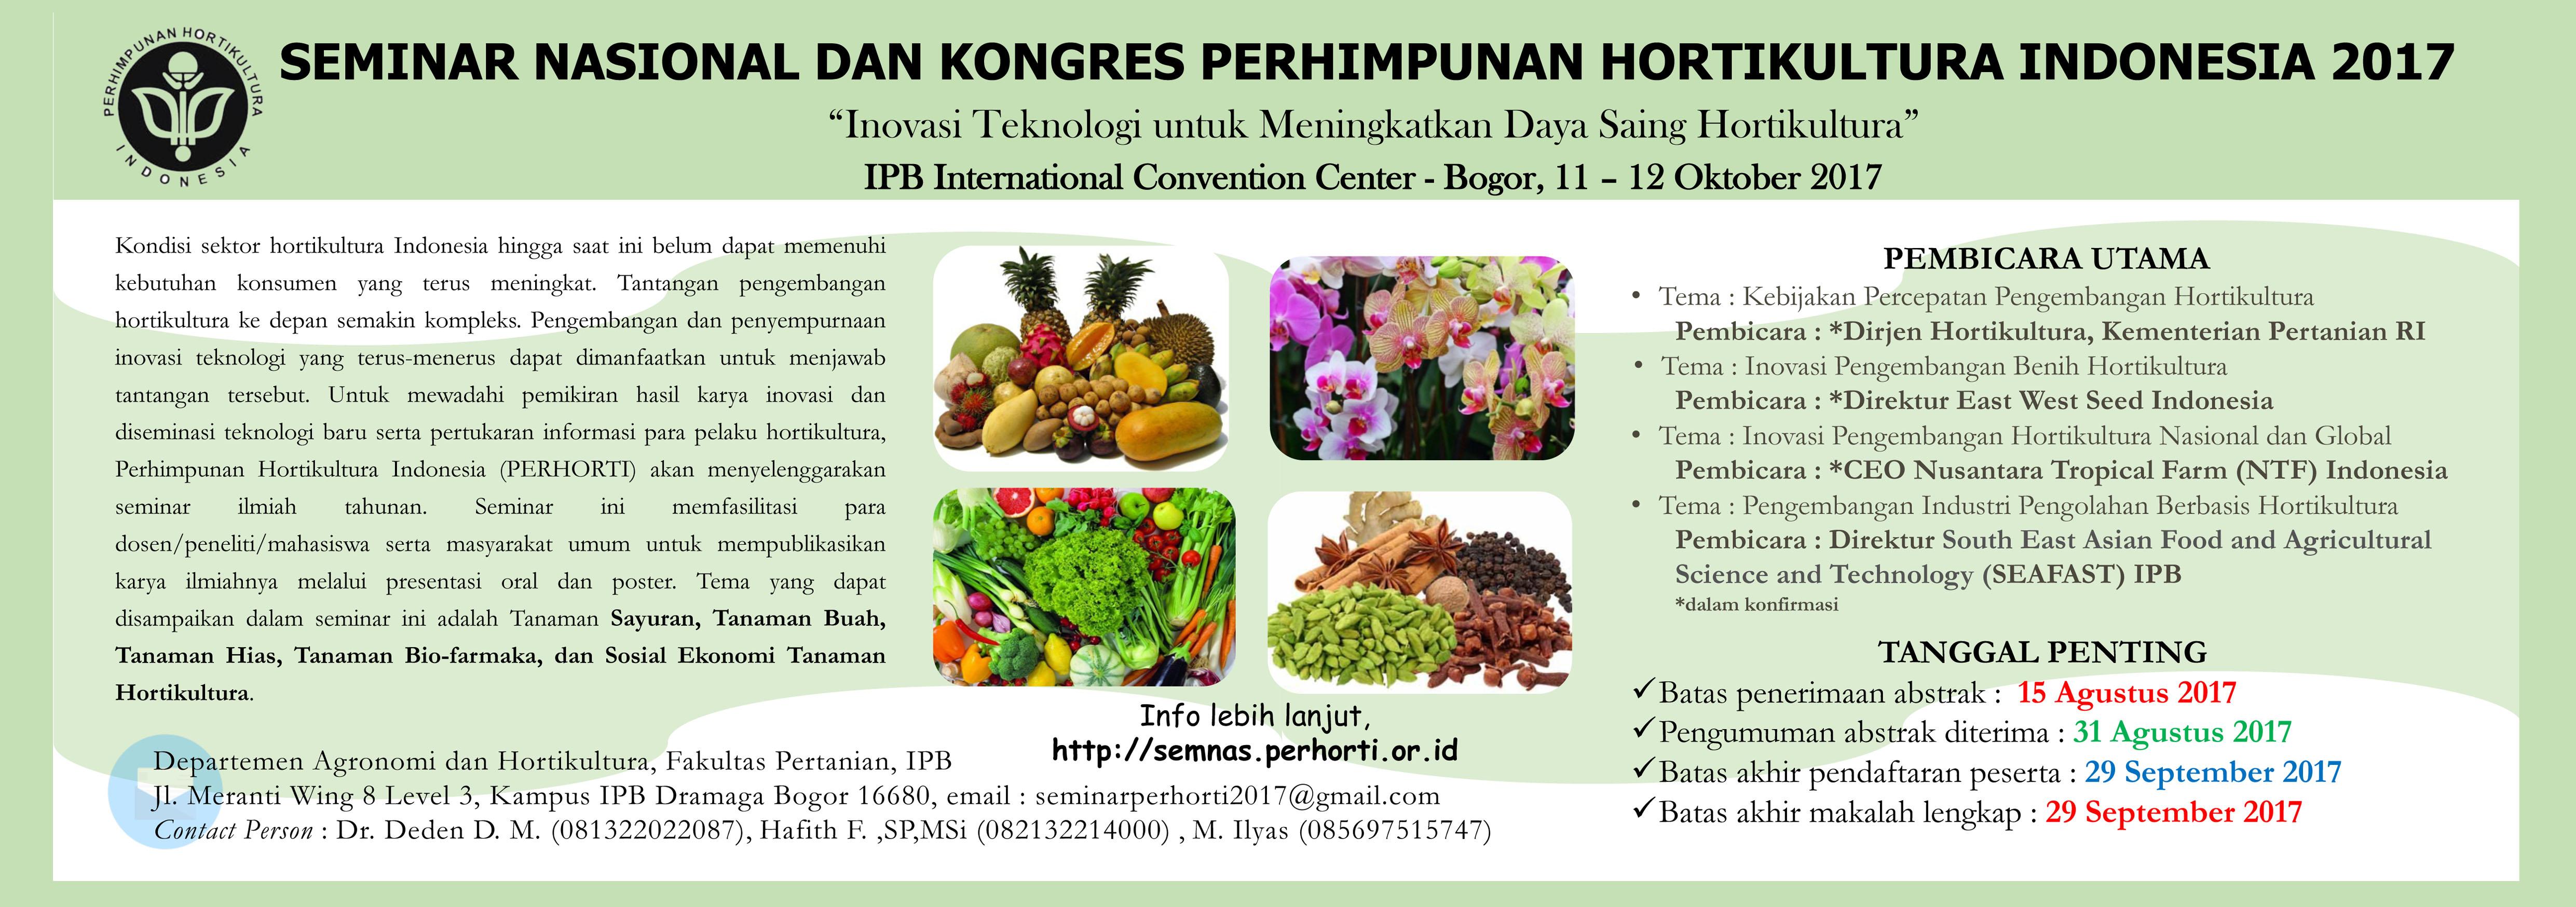 semnas-hortikultural-1